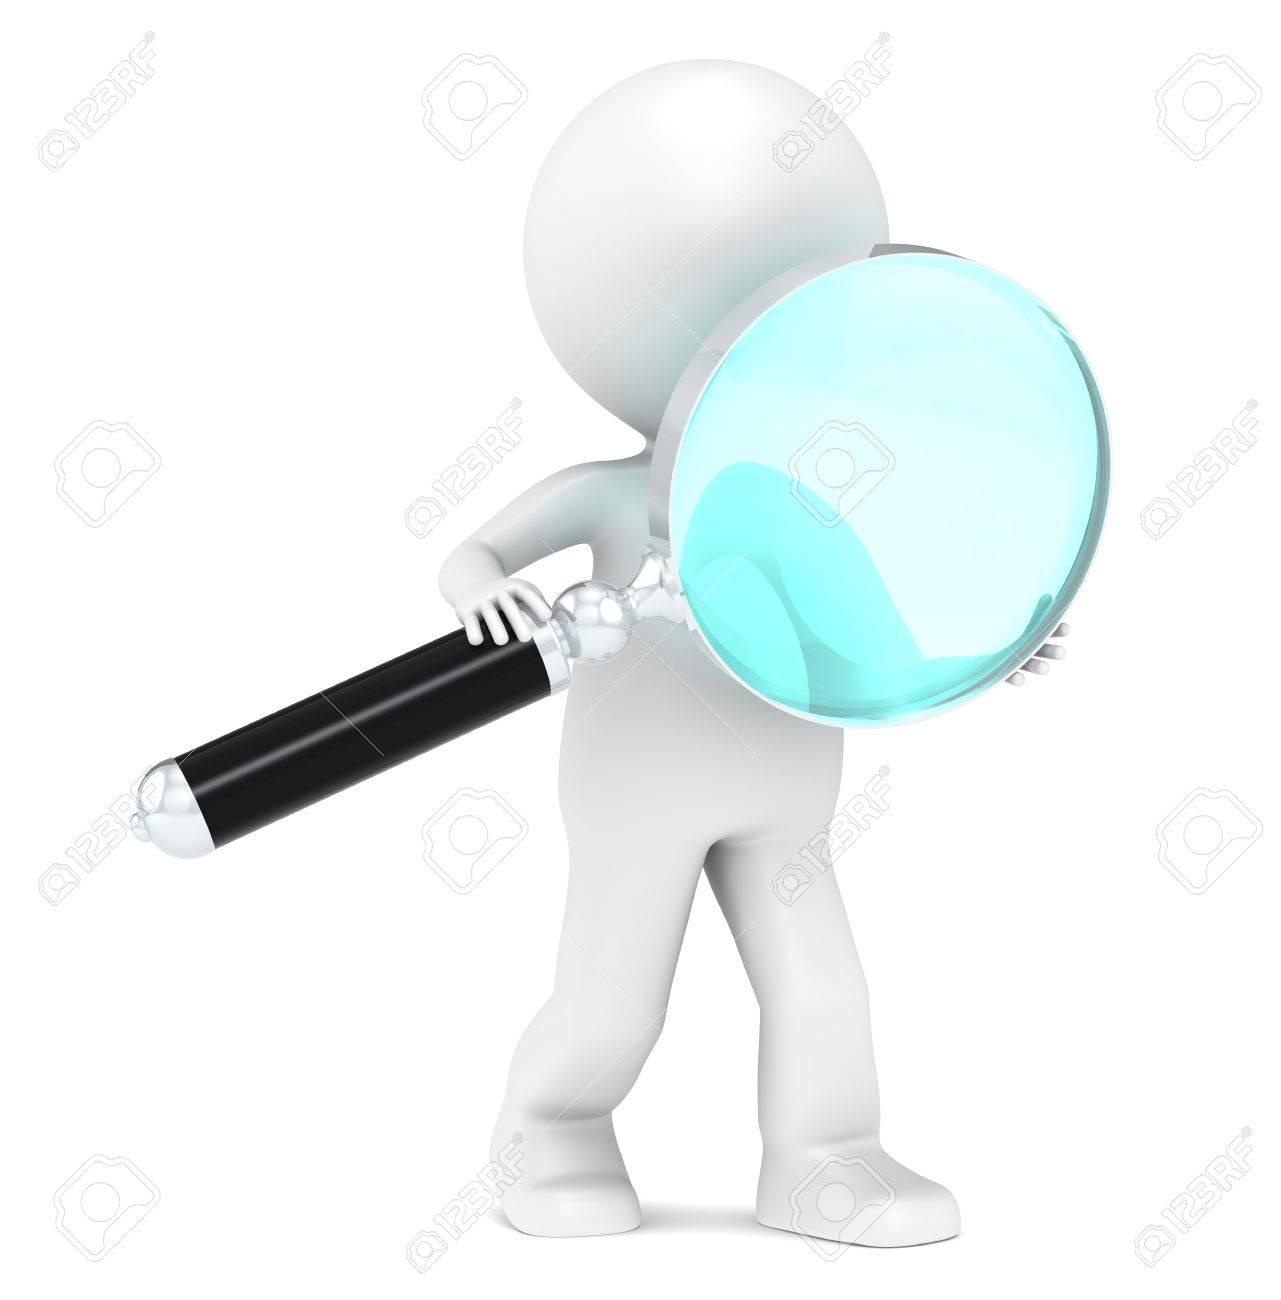 3D Little Human Character holding a Magnifying glass  Light Blue